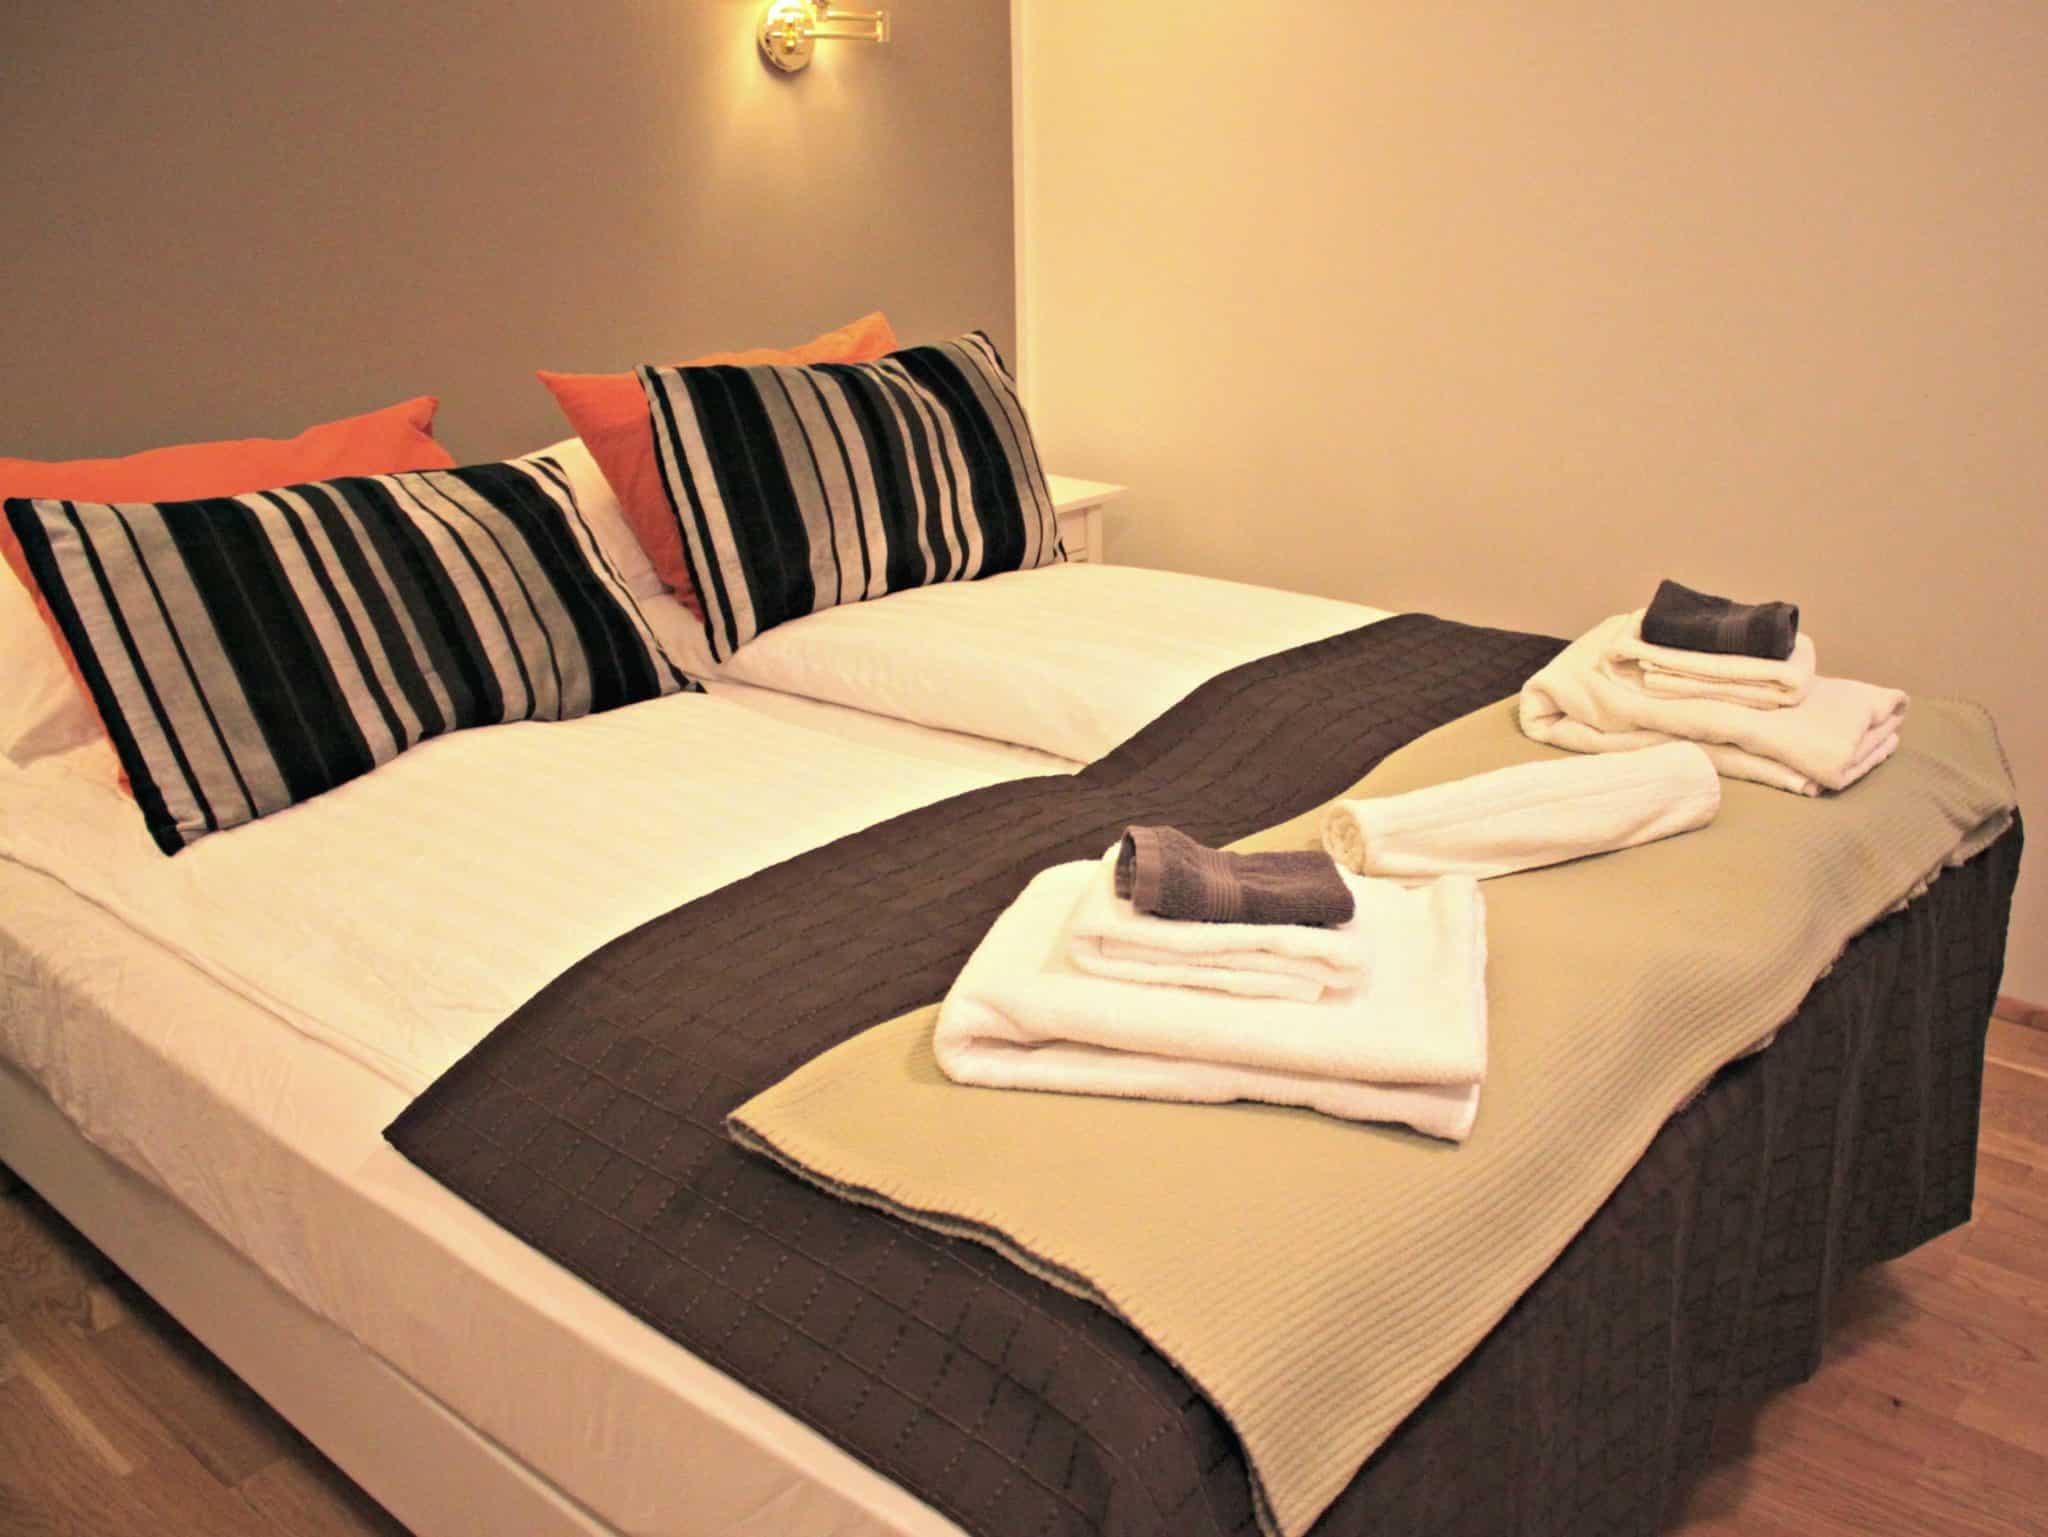 Iceland Accommodation Hotel Hella Iceland: Hotel Lækur | My Travel Monkey